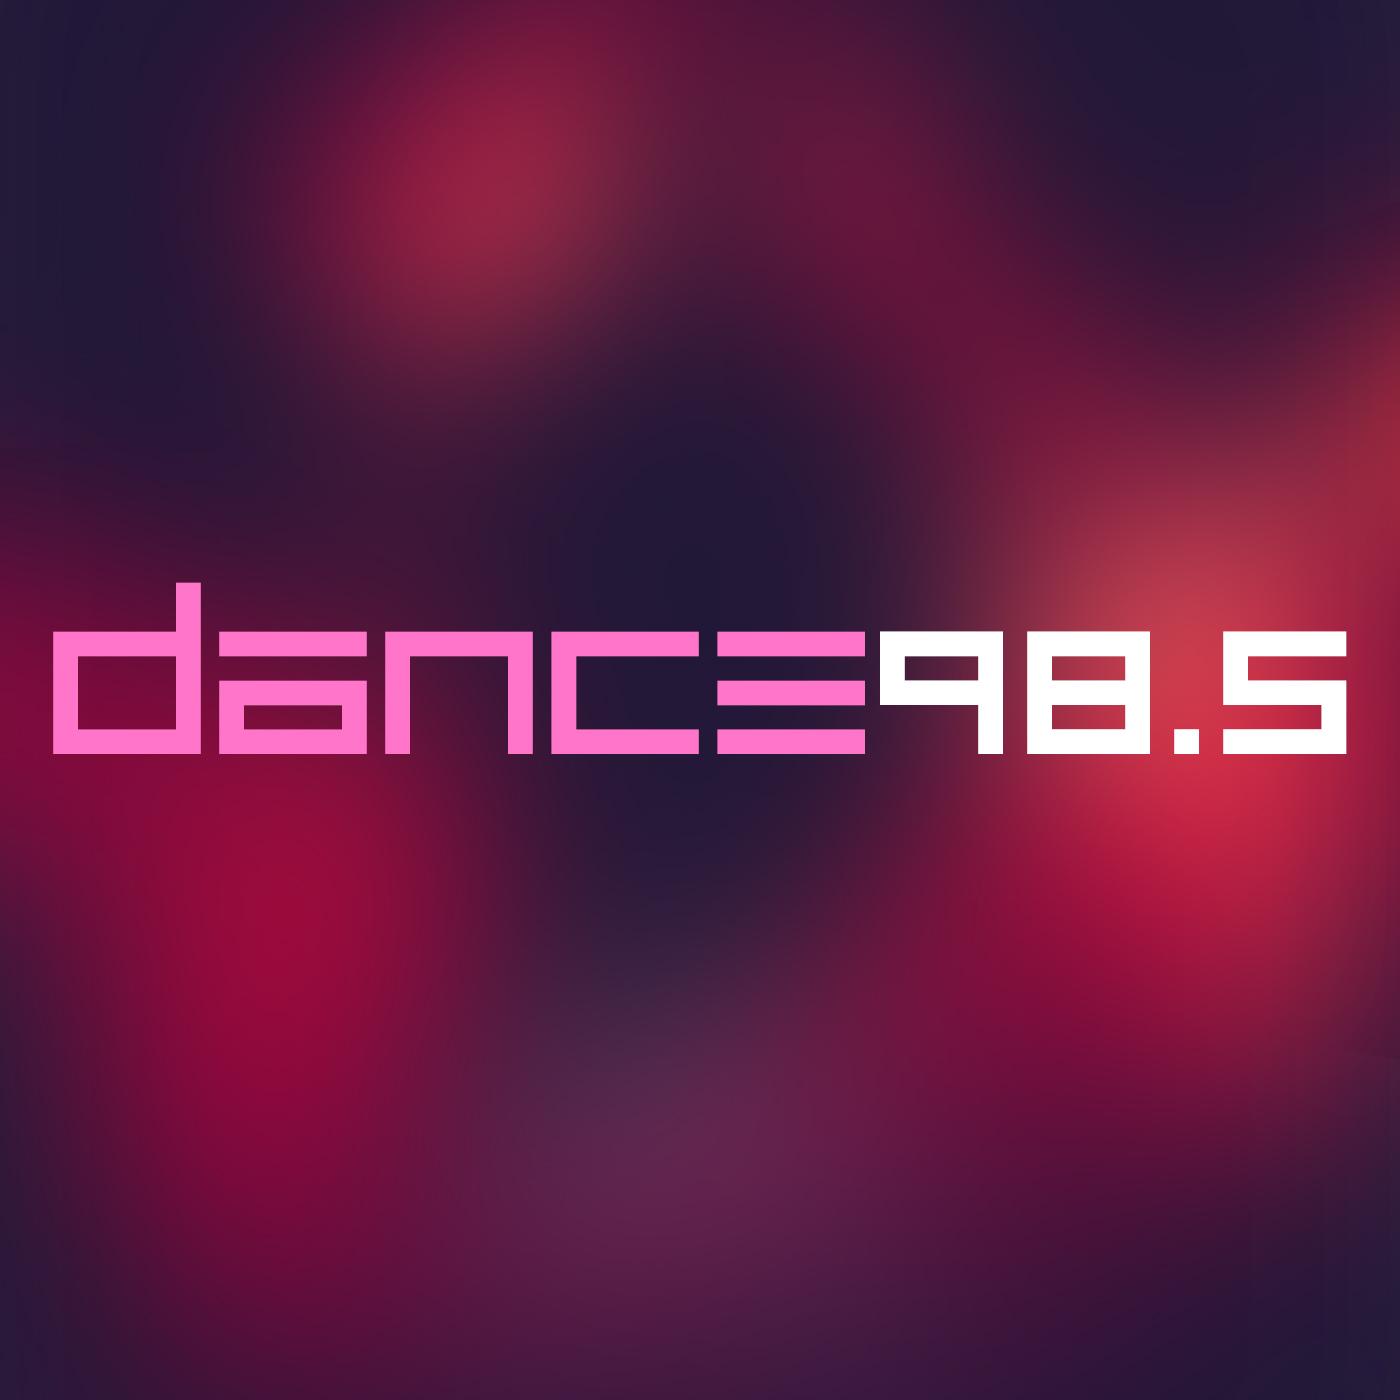 Dance 98.5   #1 Dance Pop Hits   64k   www.dance985.com